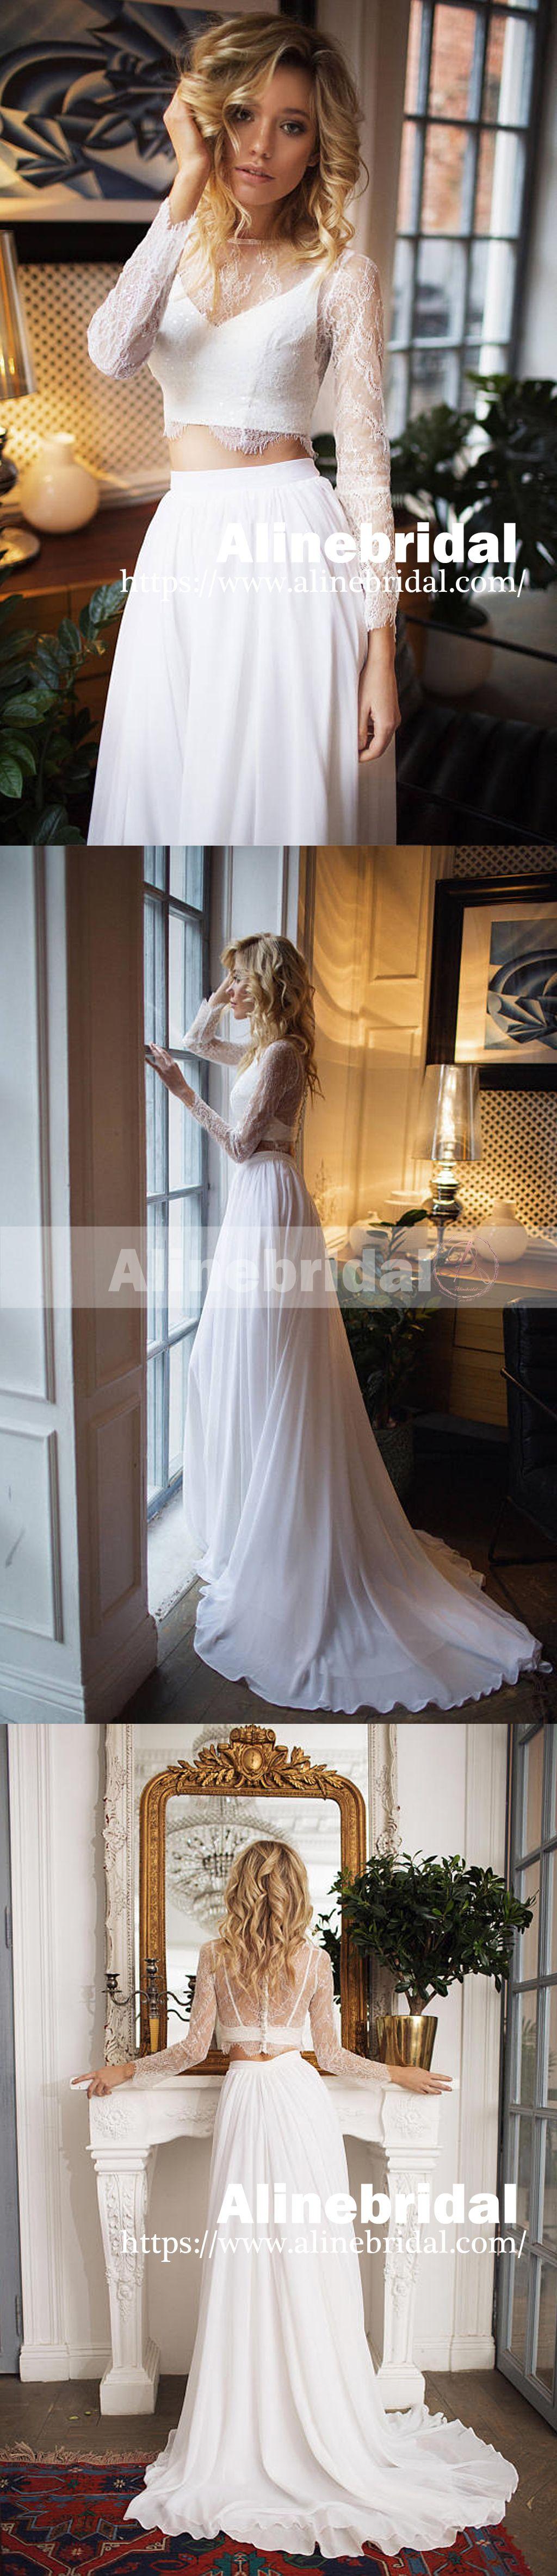 Best beach wedding dresses  Fashion Two Piece Long Sleeves Lace Top Chiffon Beach Wedding